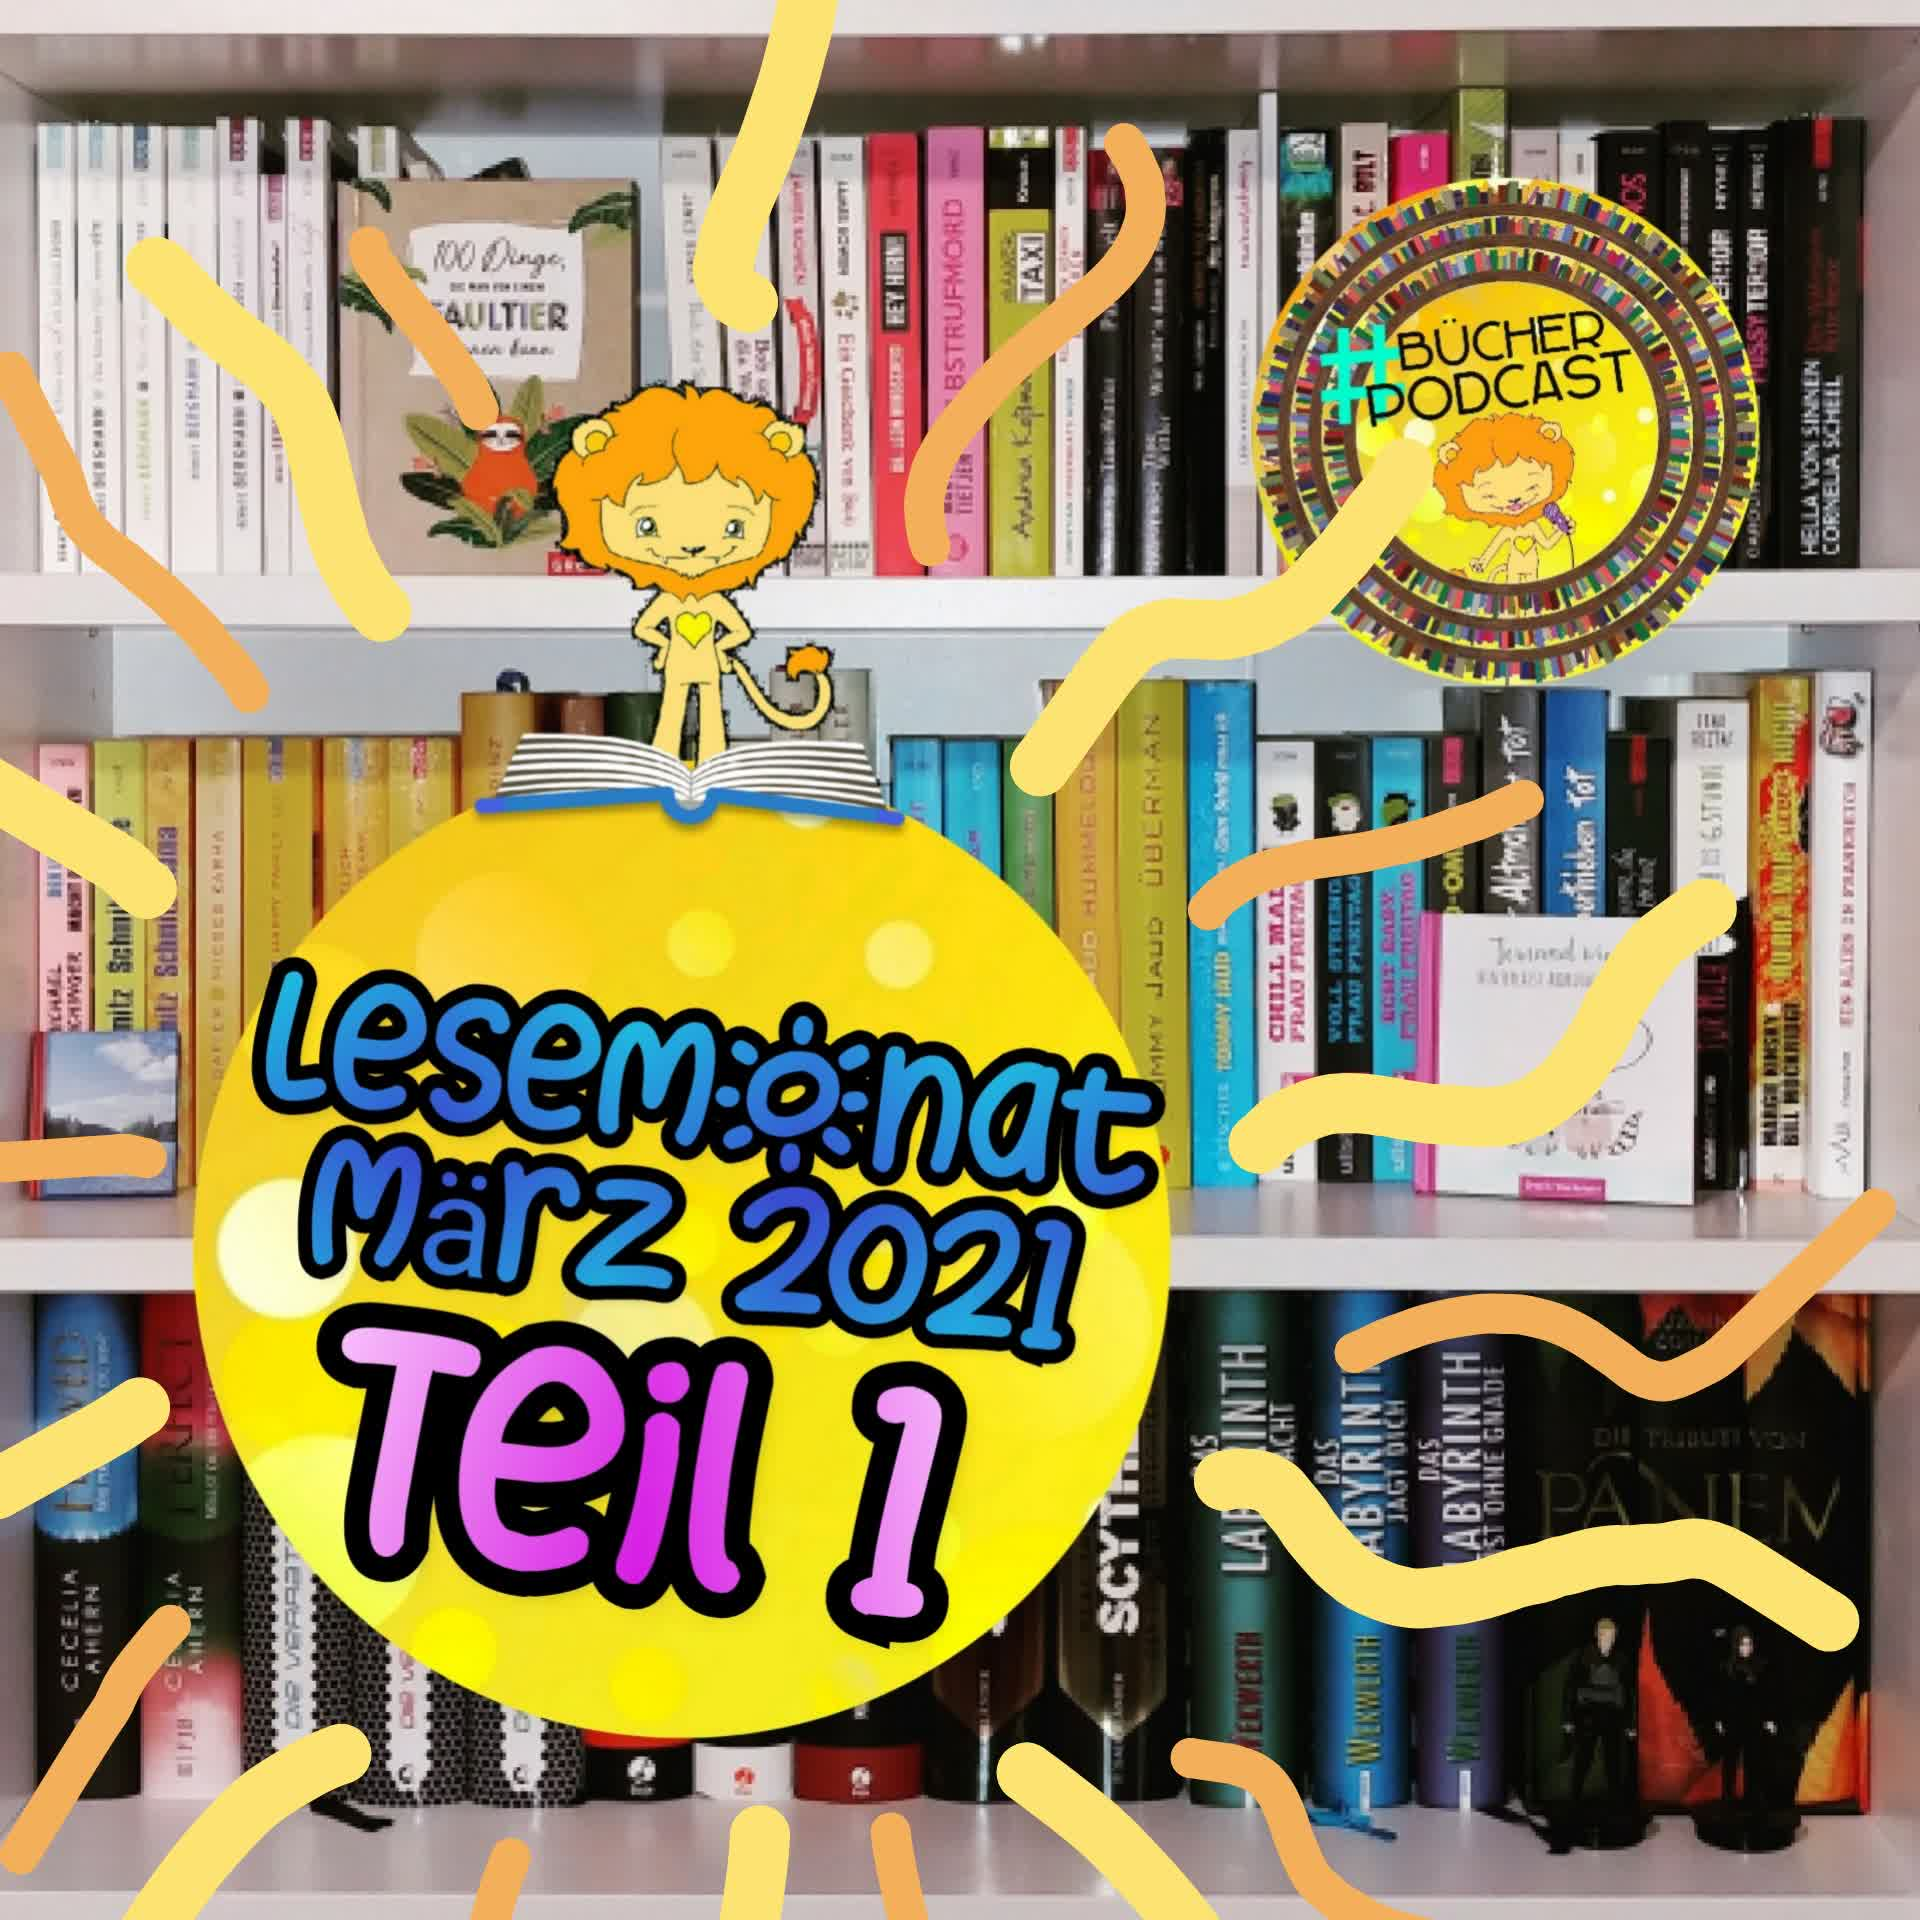 Lesemonat März 2021 - Teil 1